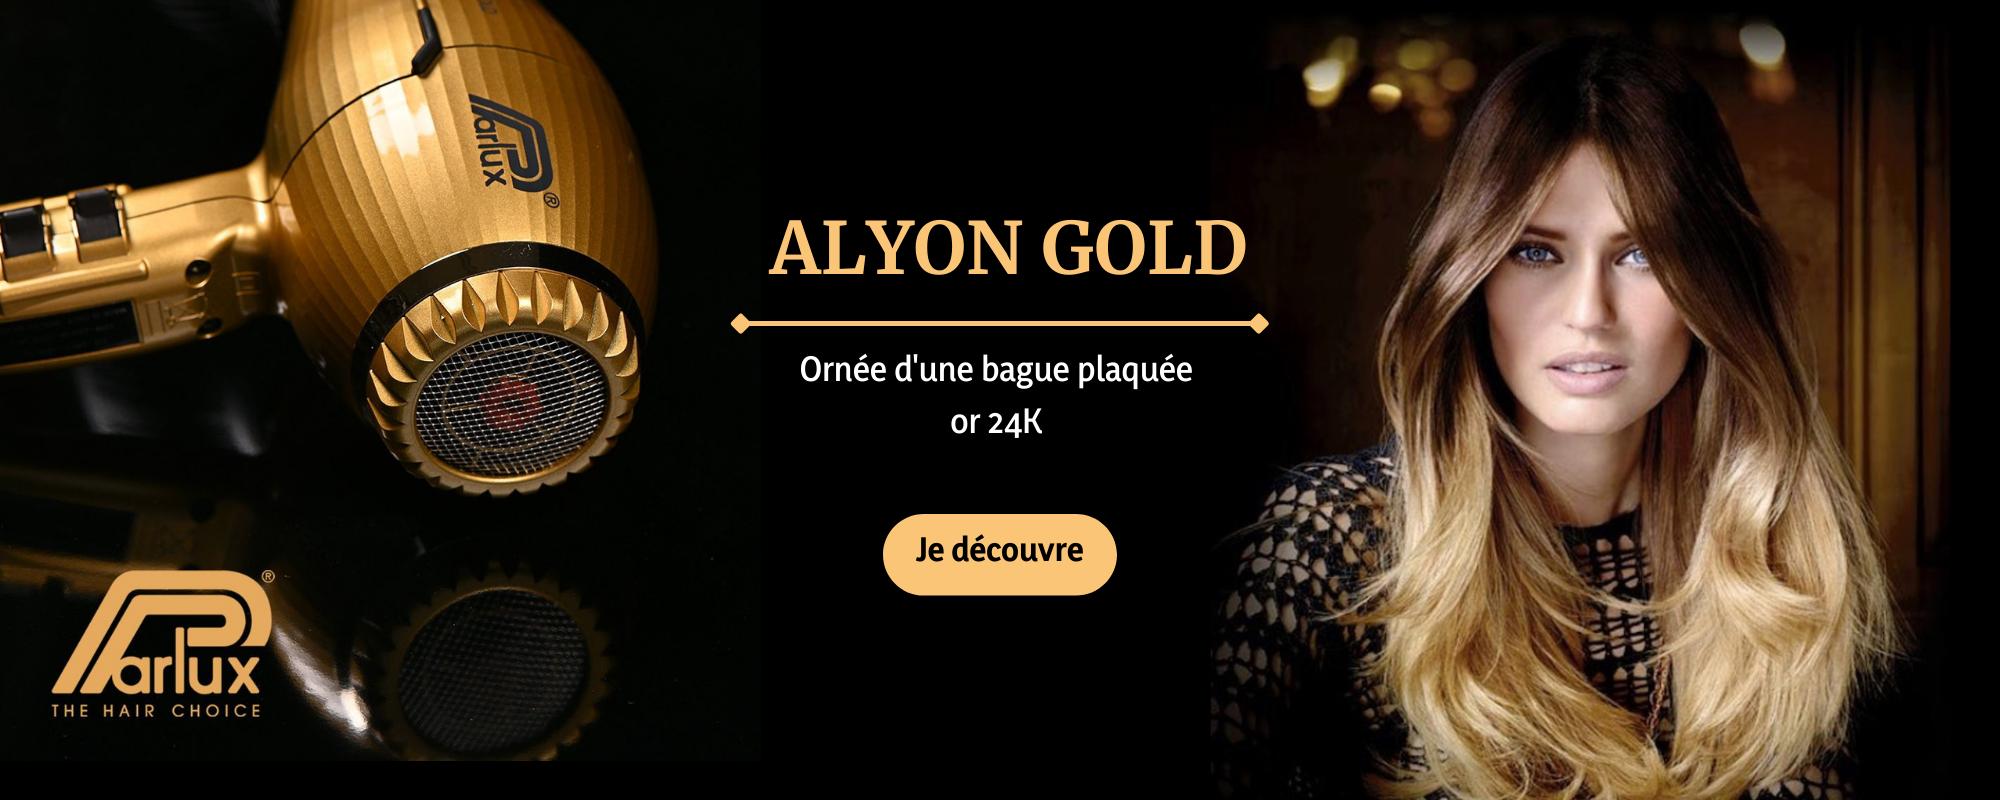 alyon gold parlux